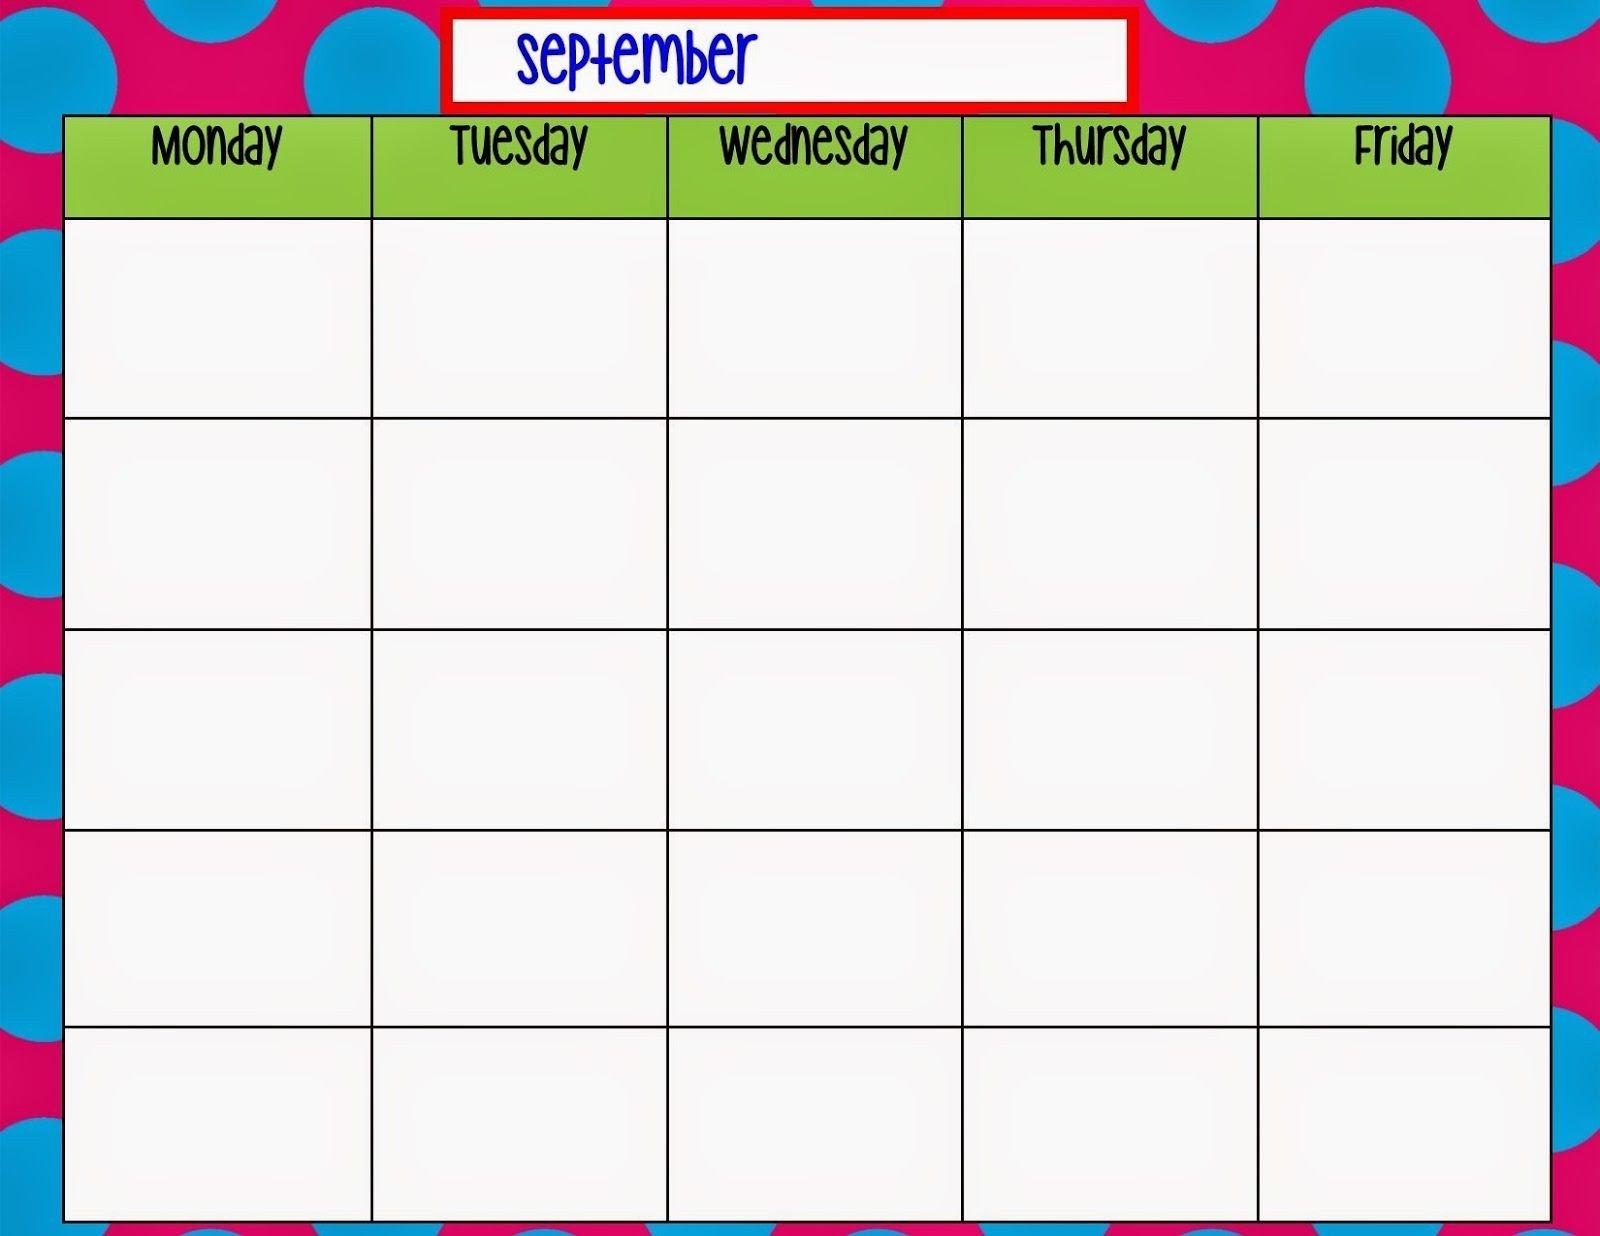 Monday To Friday Blank Calendar Printable   Calendar Monday To Friday Blank Week Schedule